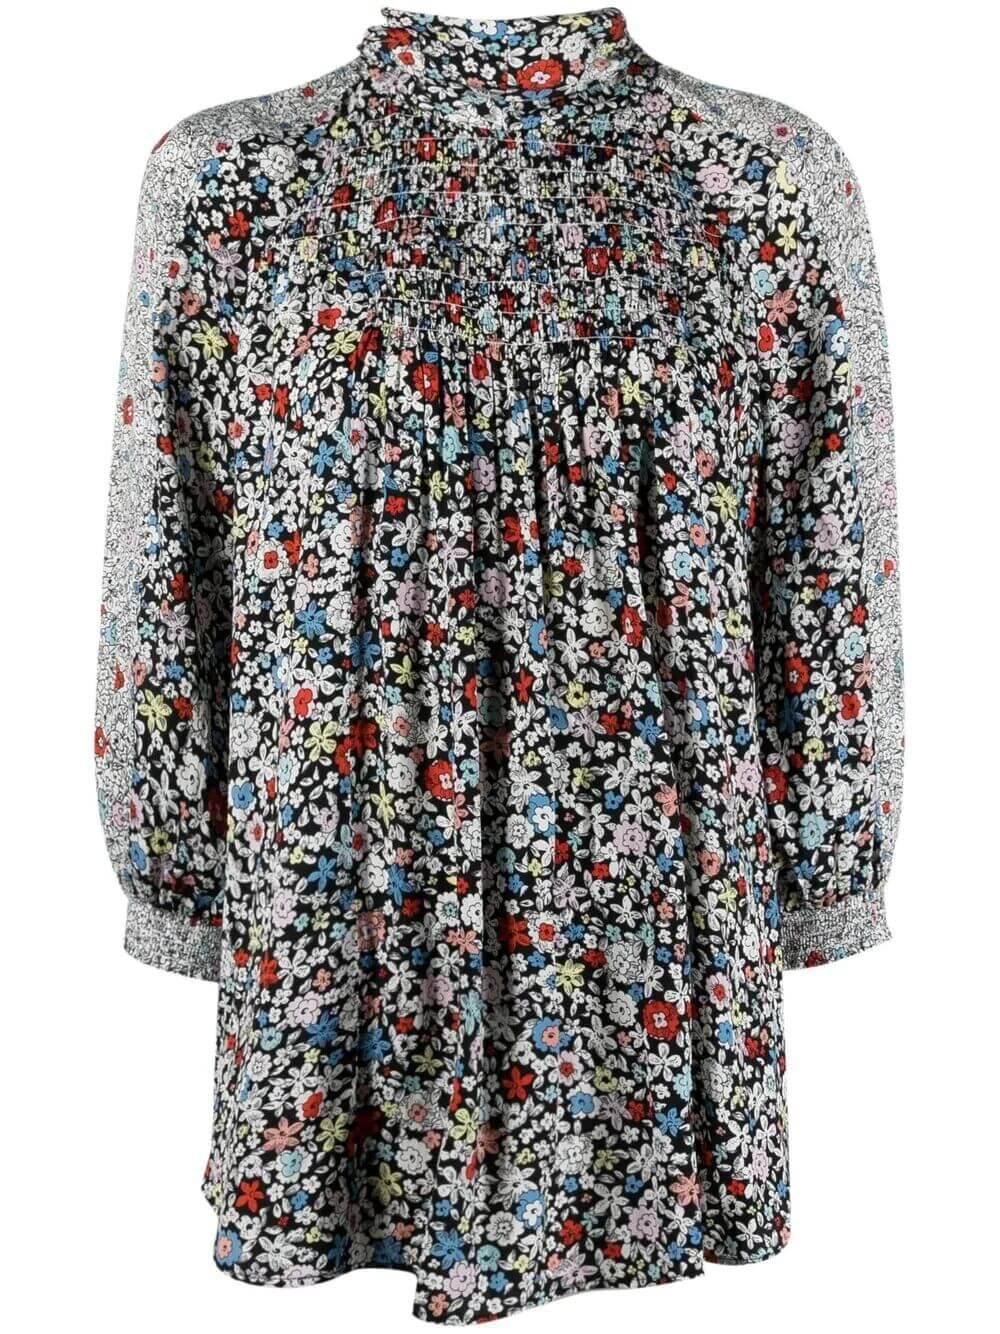 Floral- Print Pleated Blouse Item # CHS21UHT03023